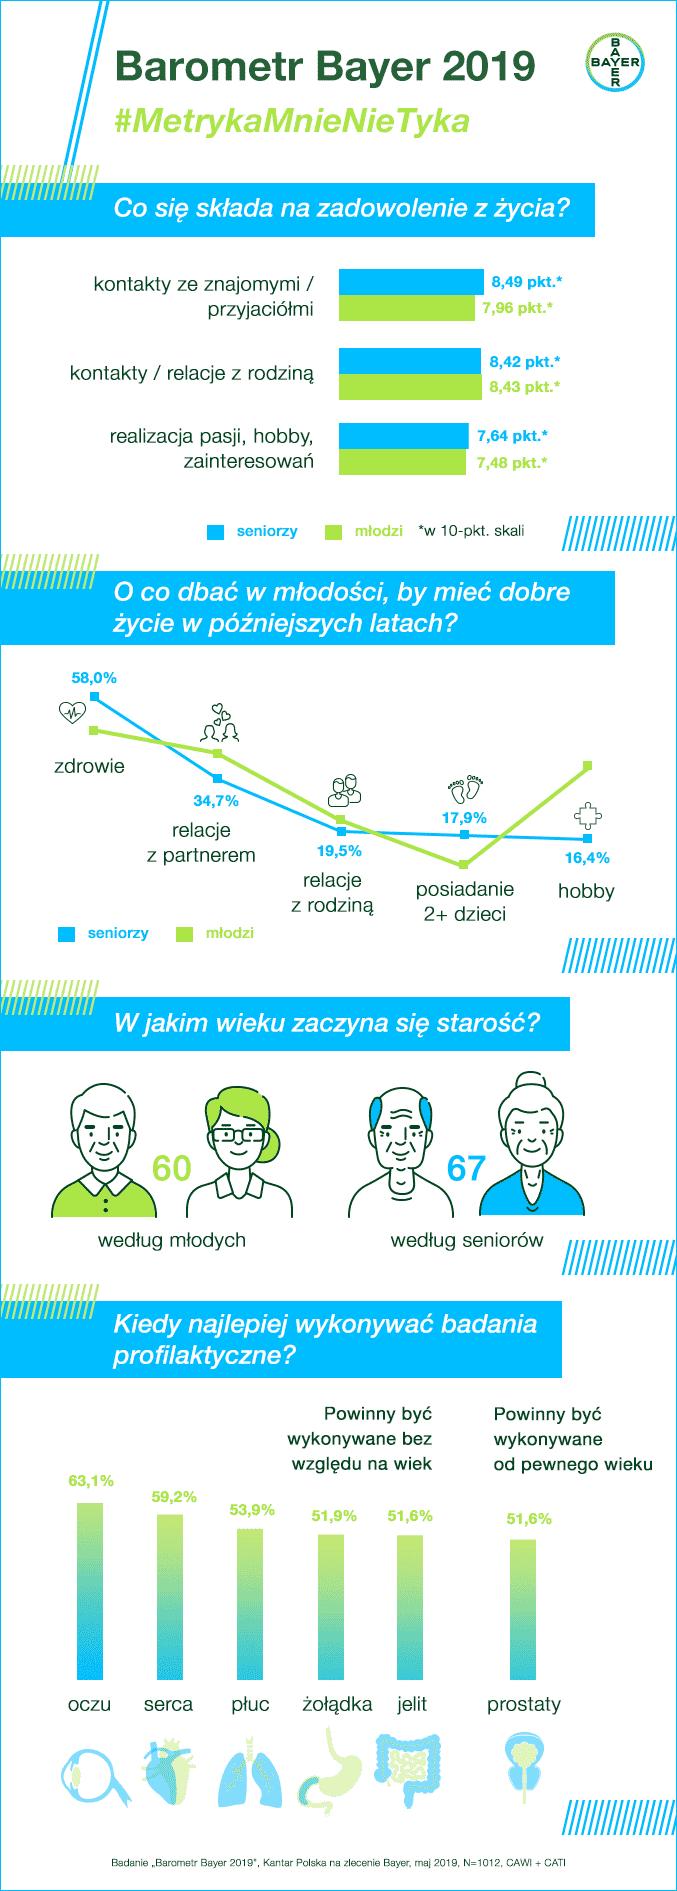 Barometr Bayer - infografika